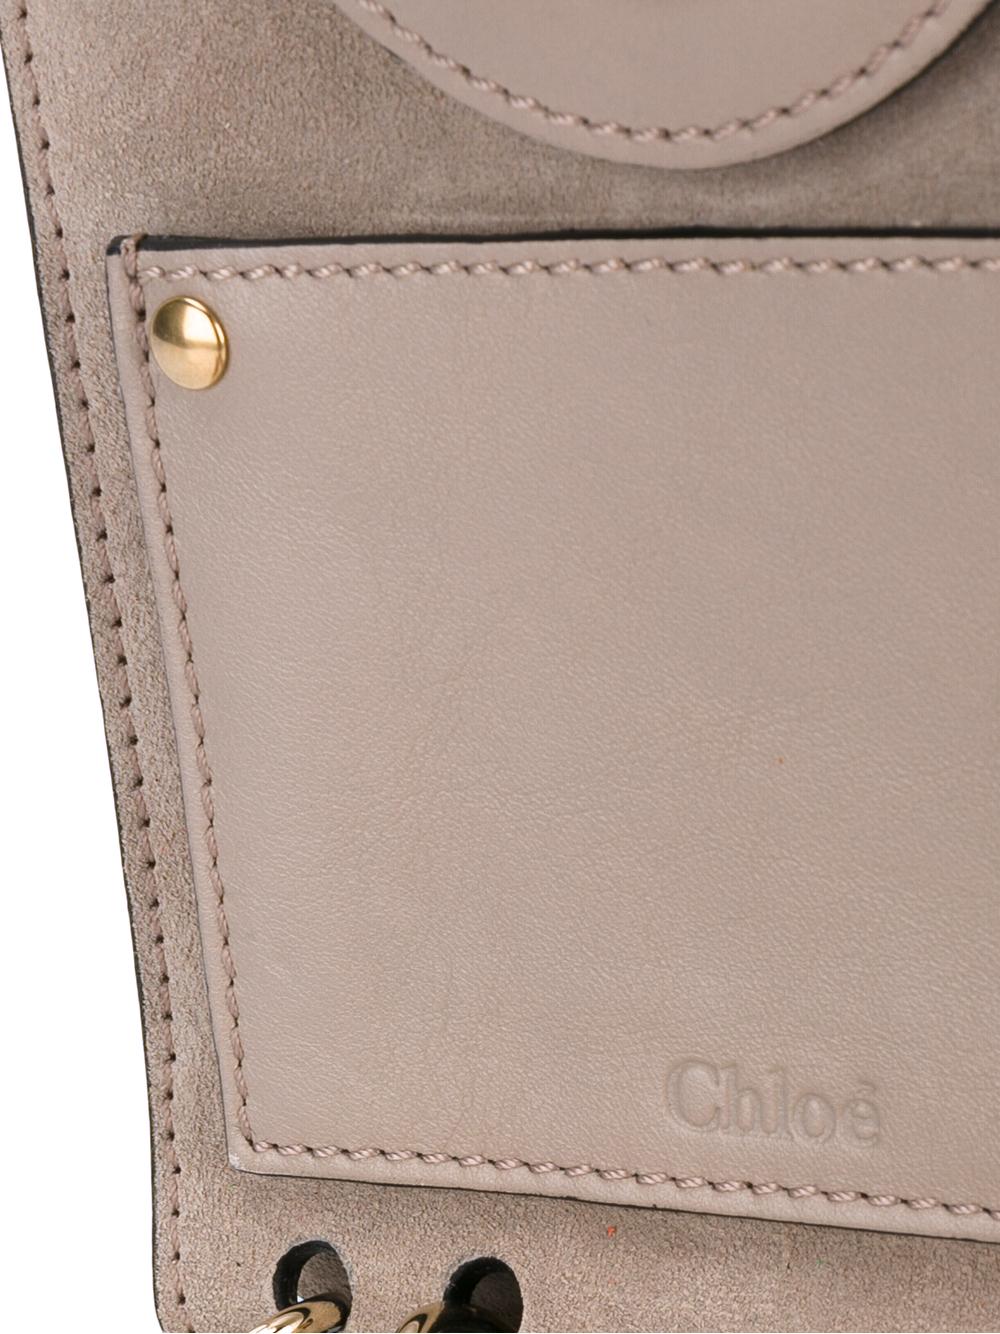 Chlo�� Mini Jane Bracelet Bag in Beige (GREY) | Lyst